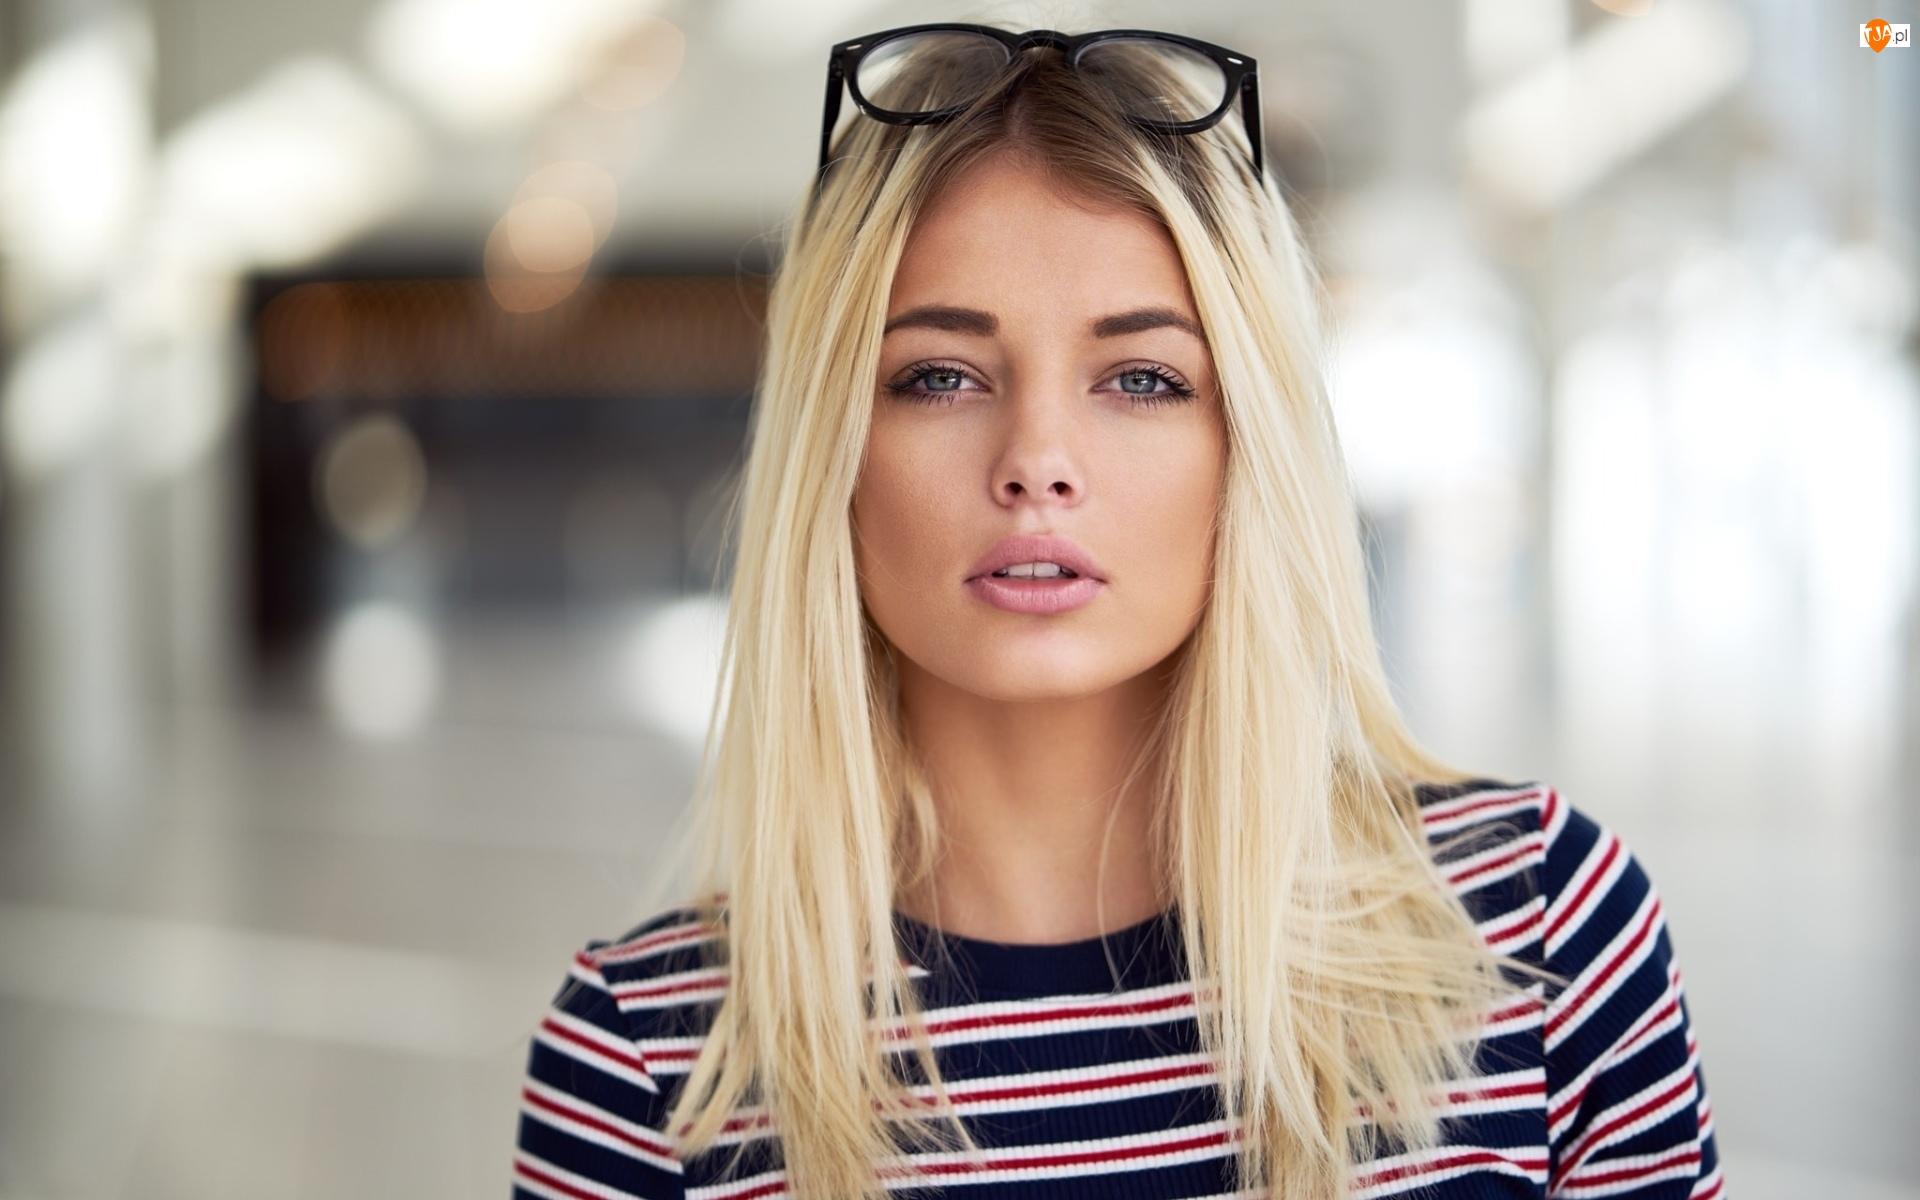 Fryzura dla blondyna